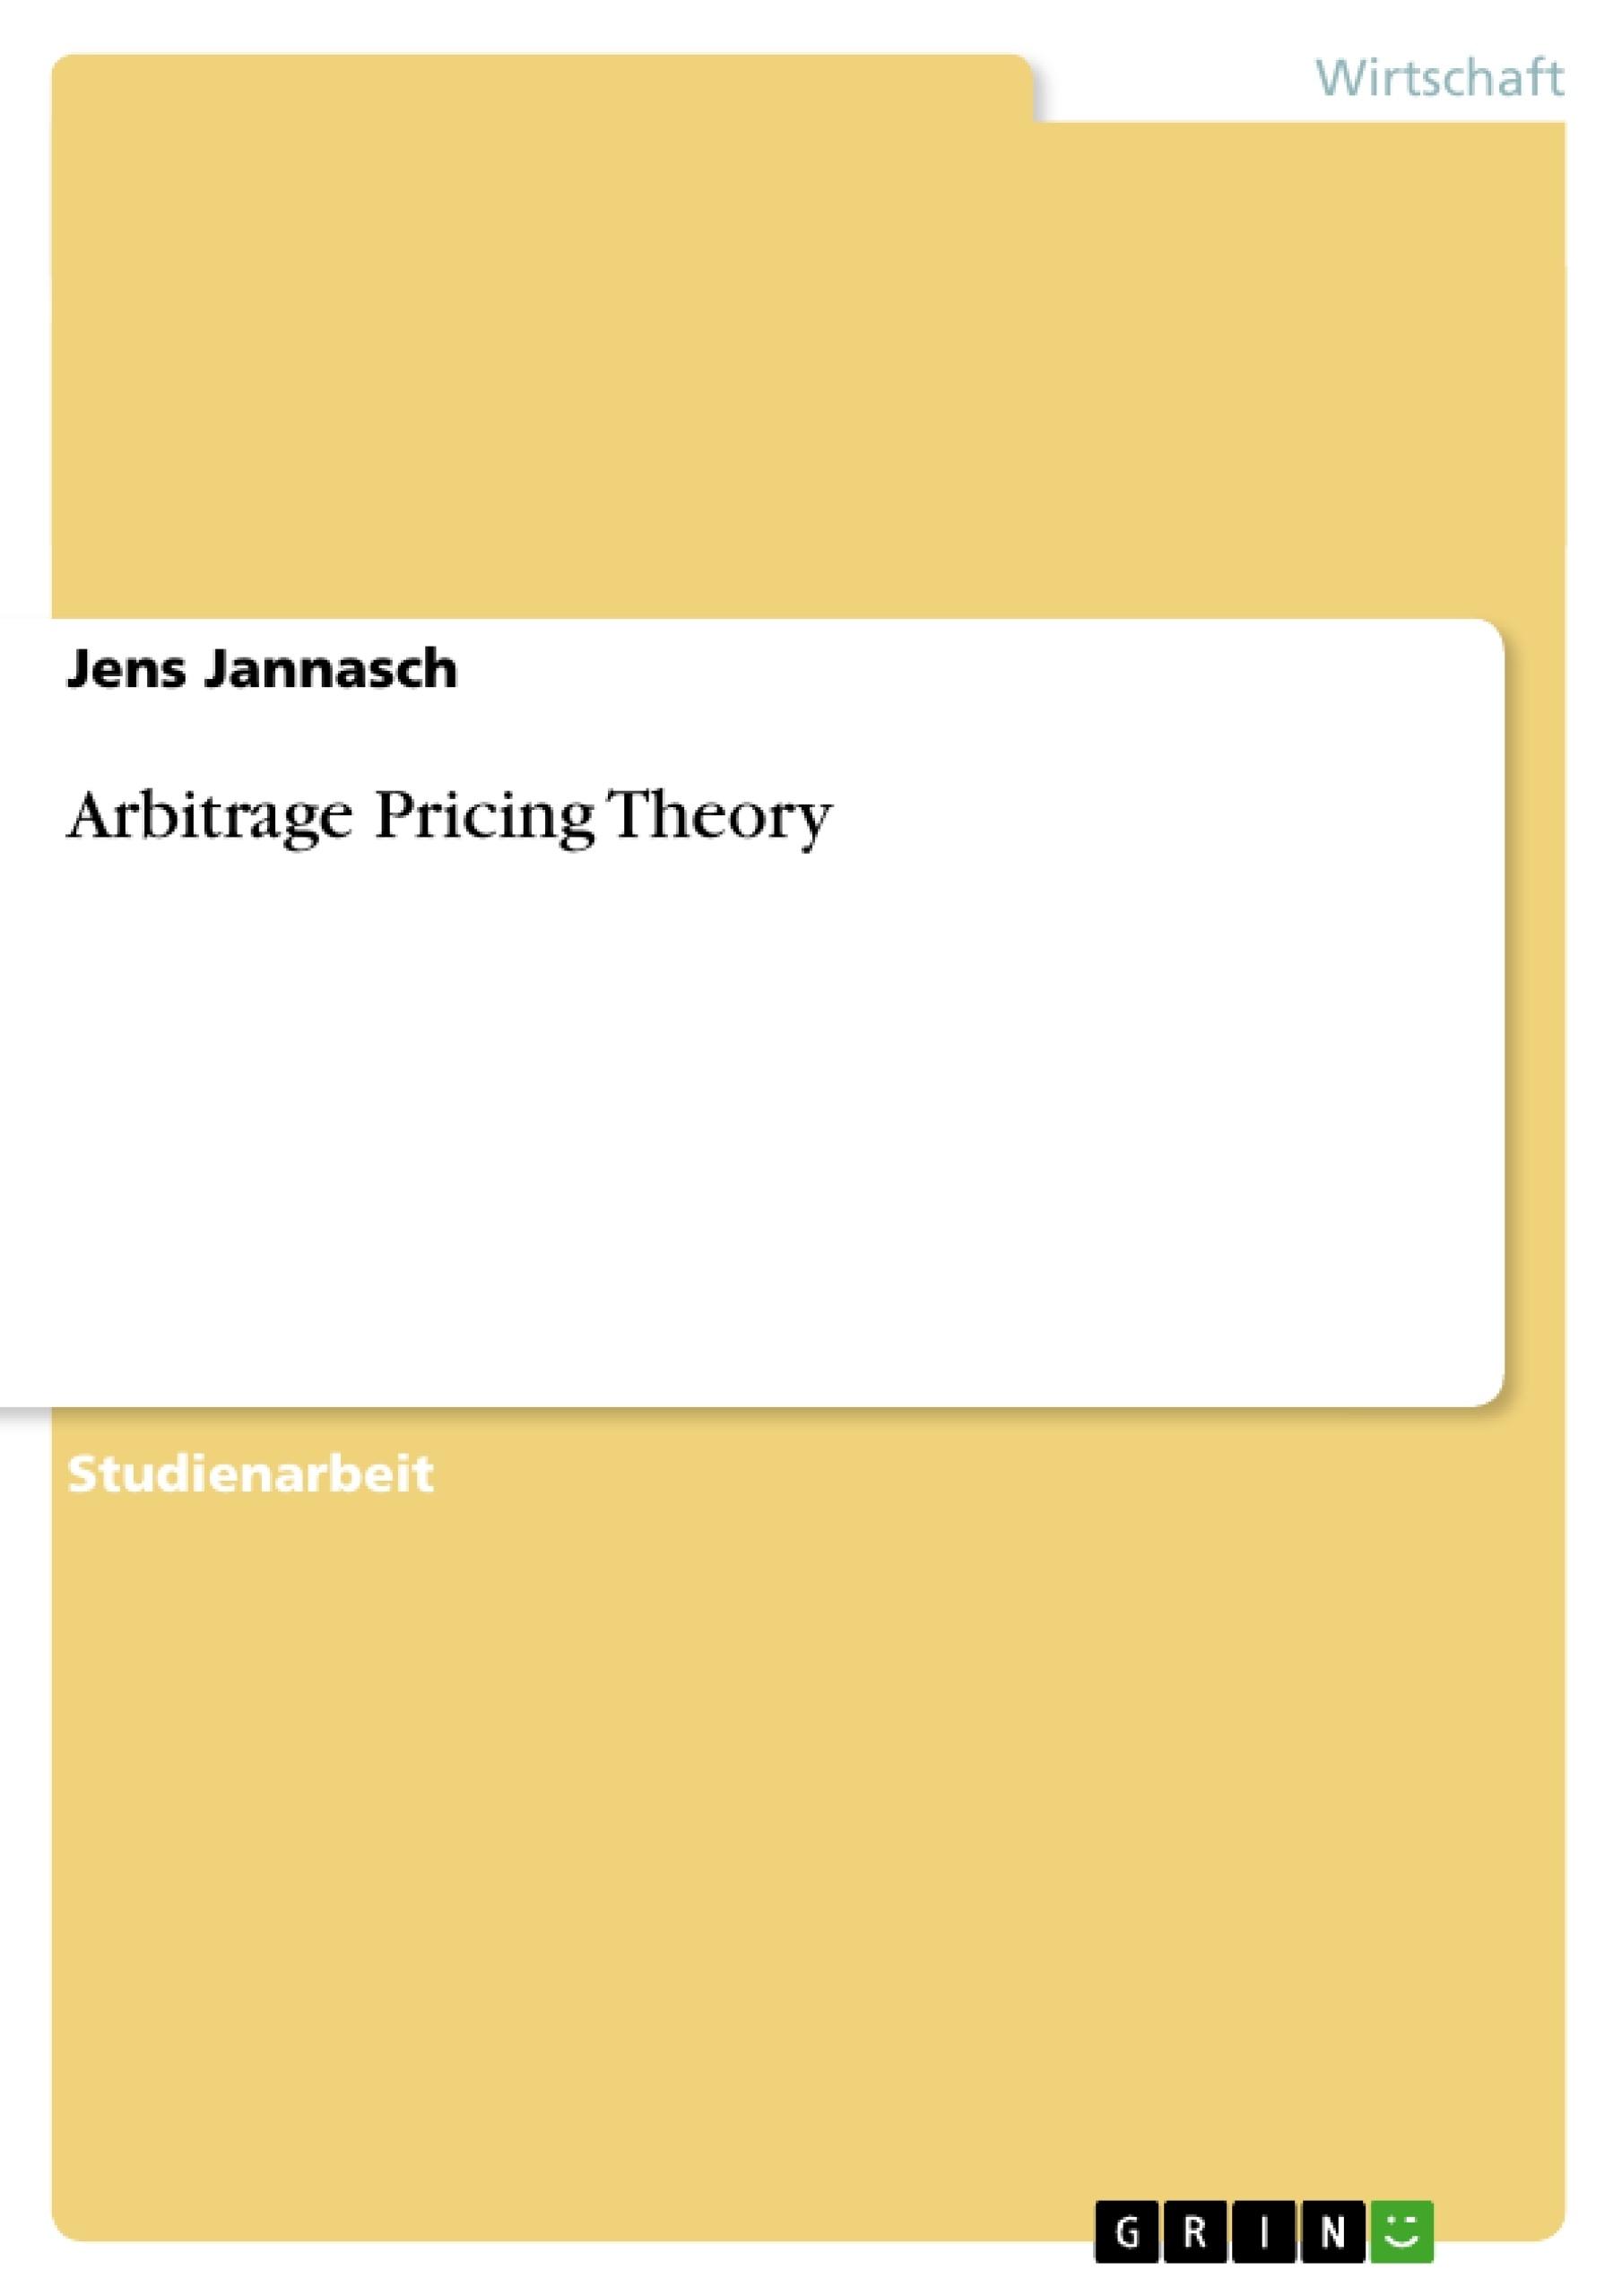 Titel: Arbitrage Pricing Theory